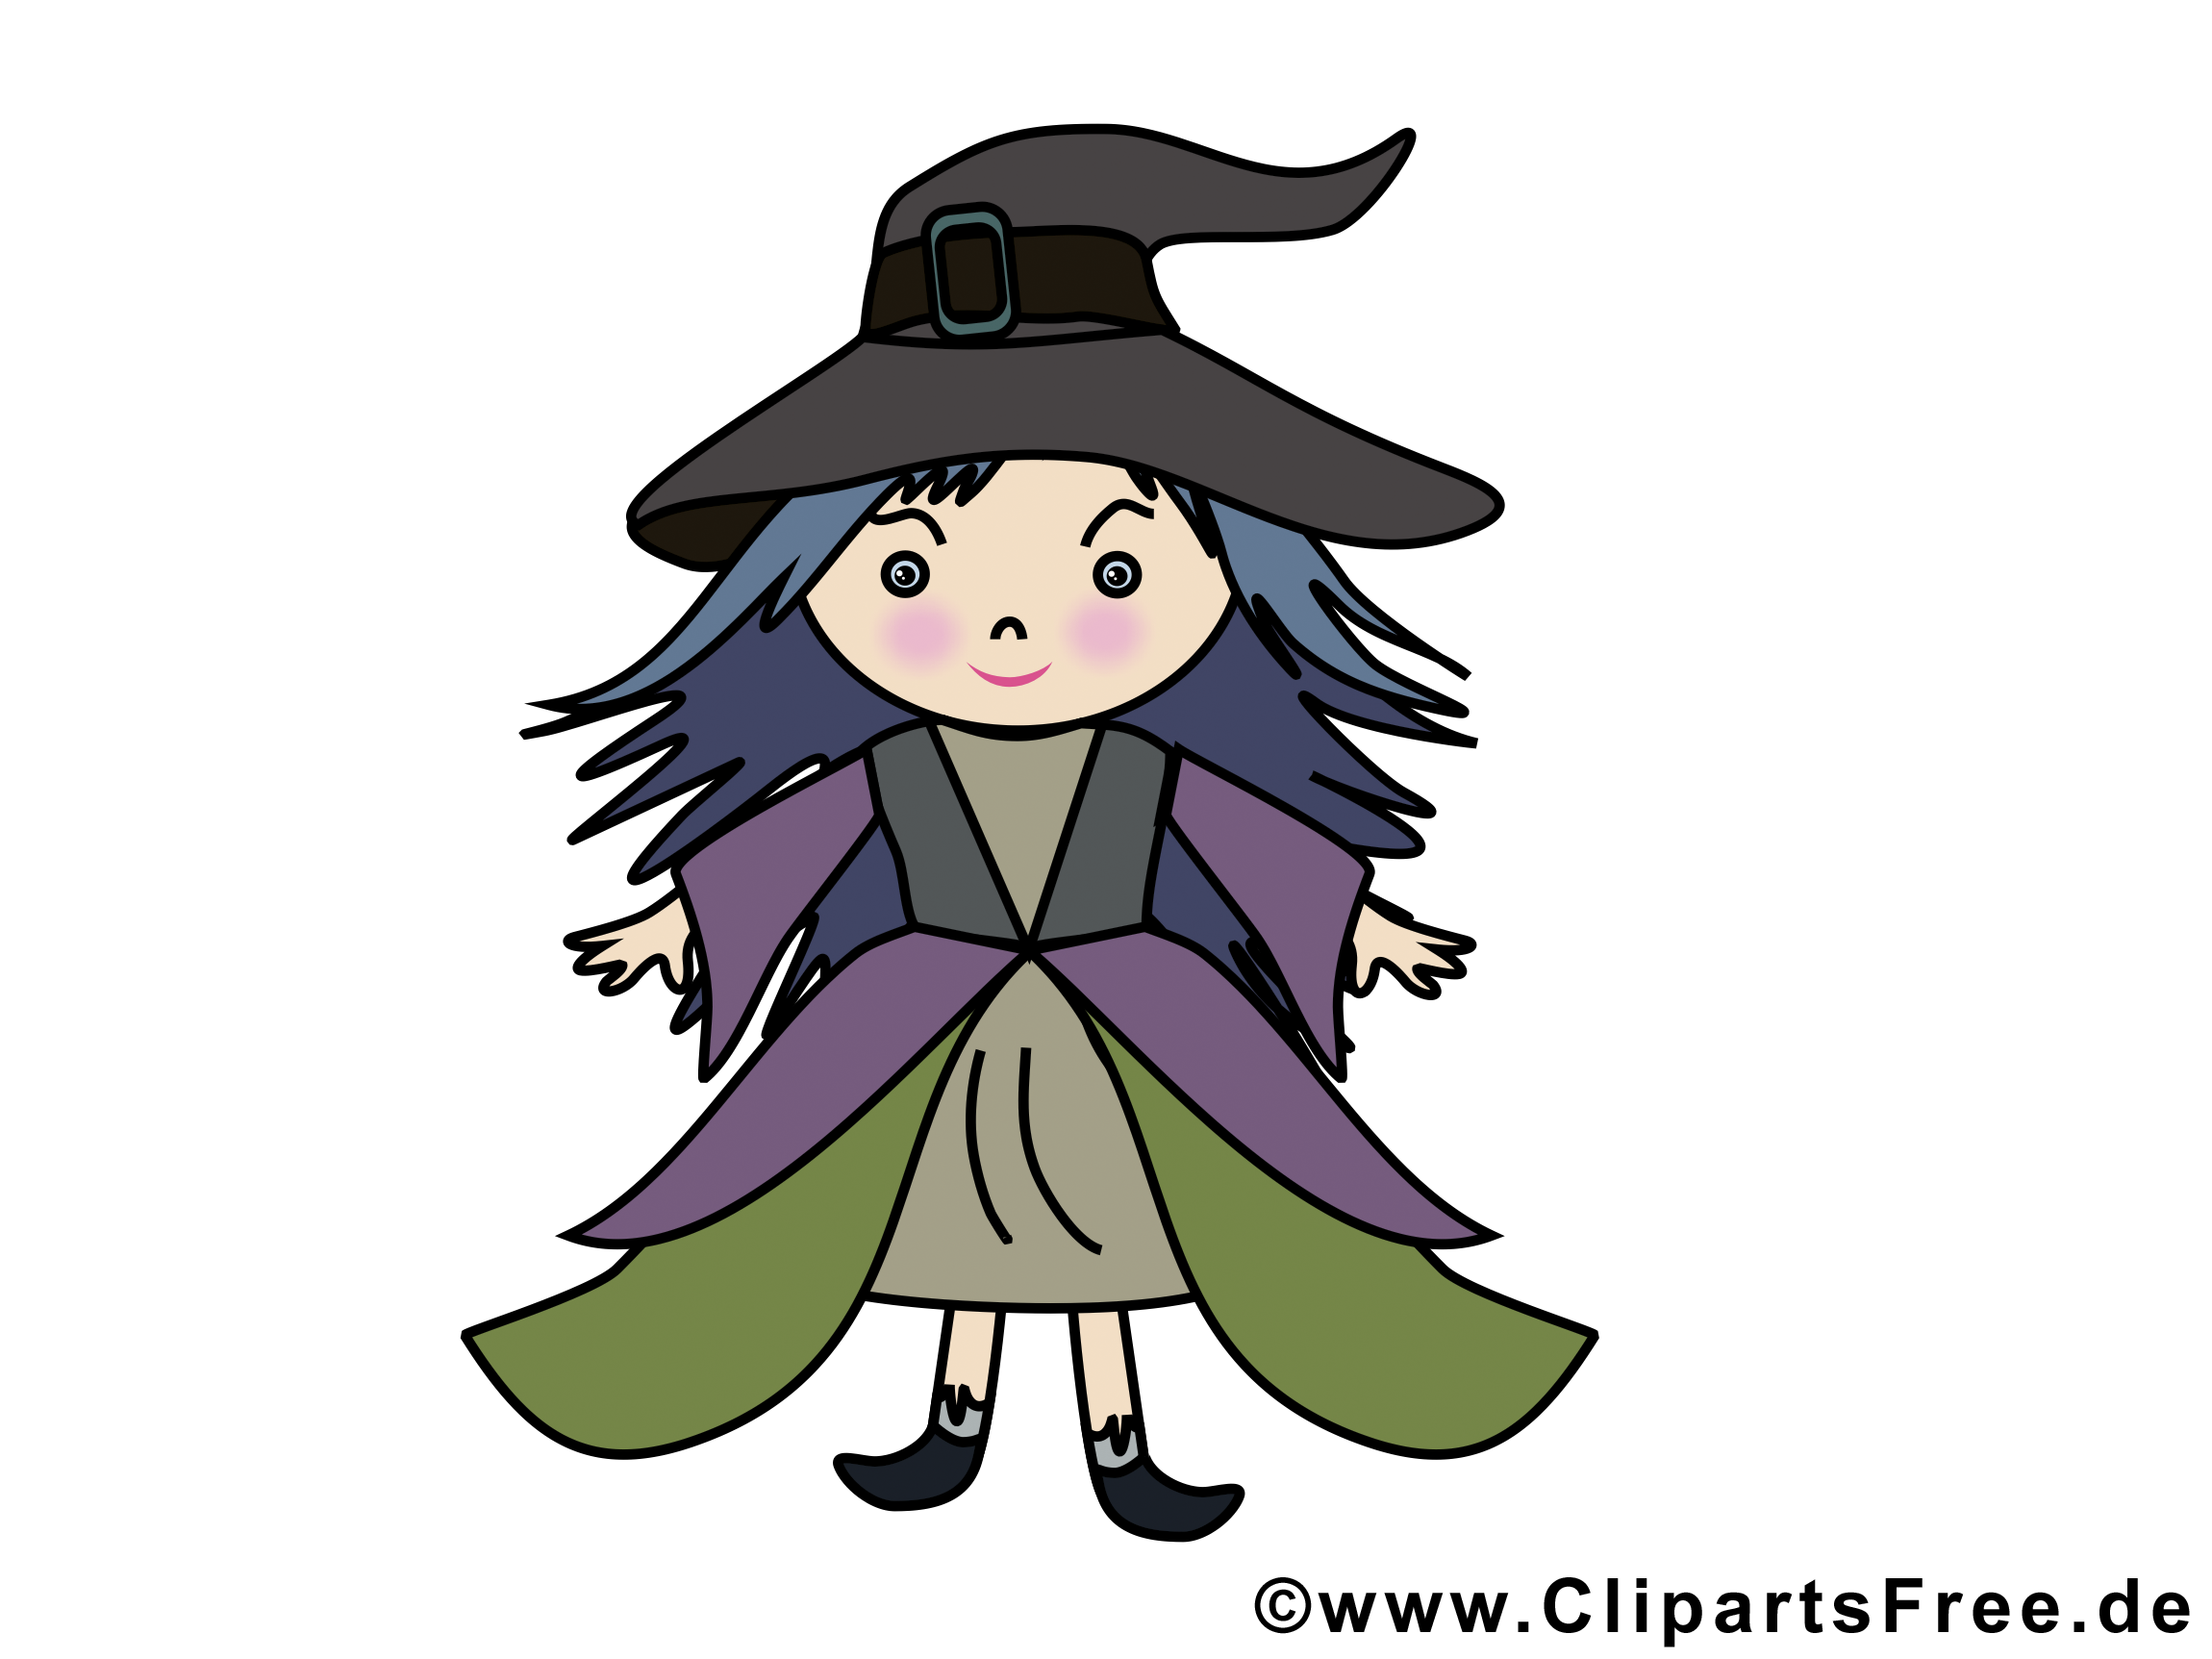 clipart halloween hexen - photo #40